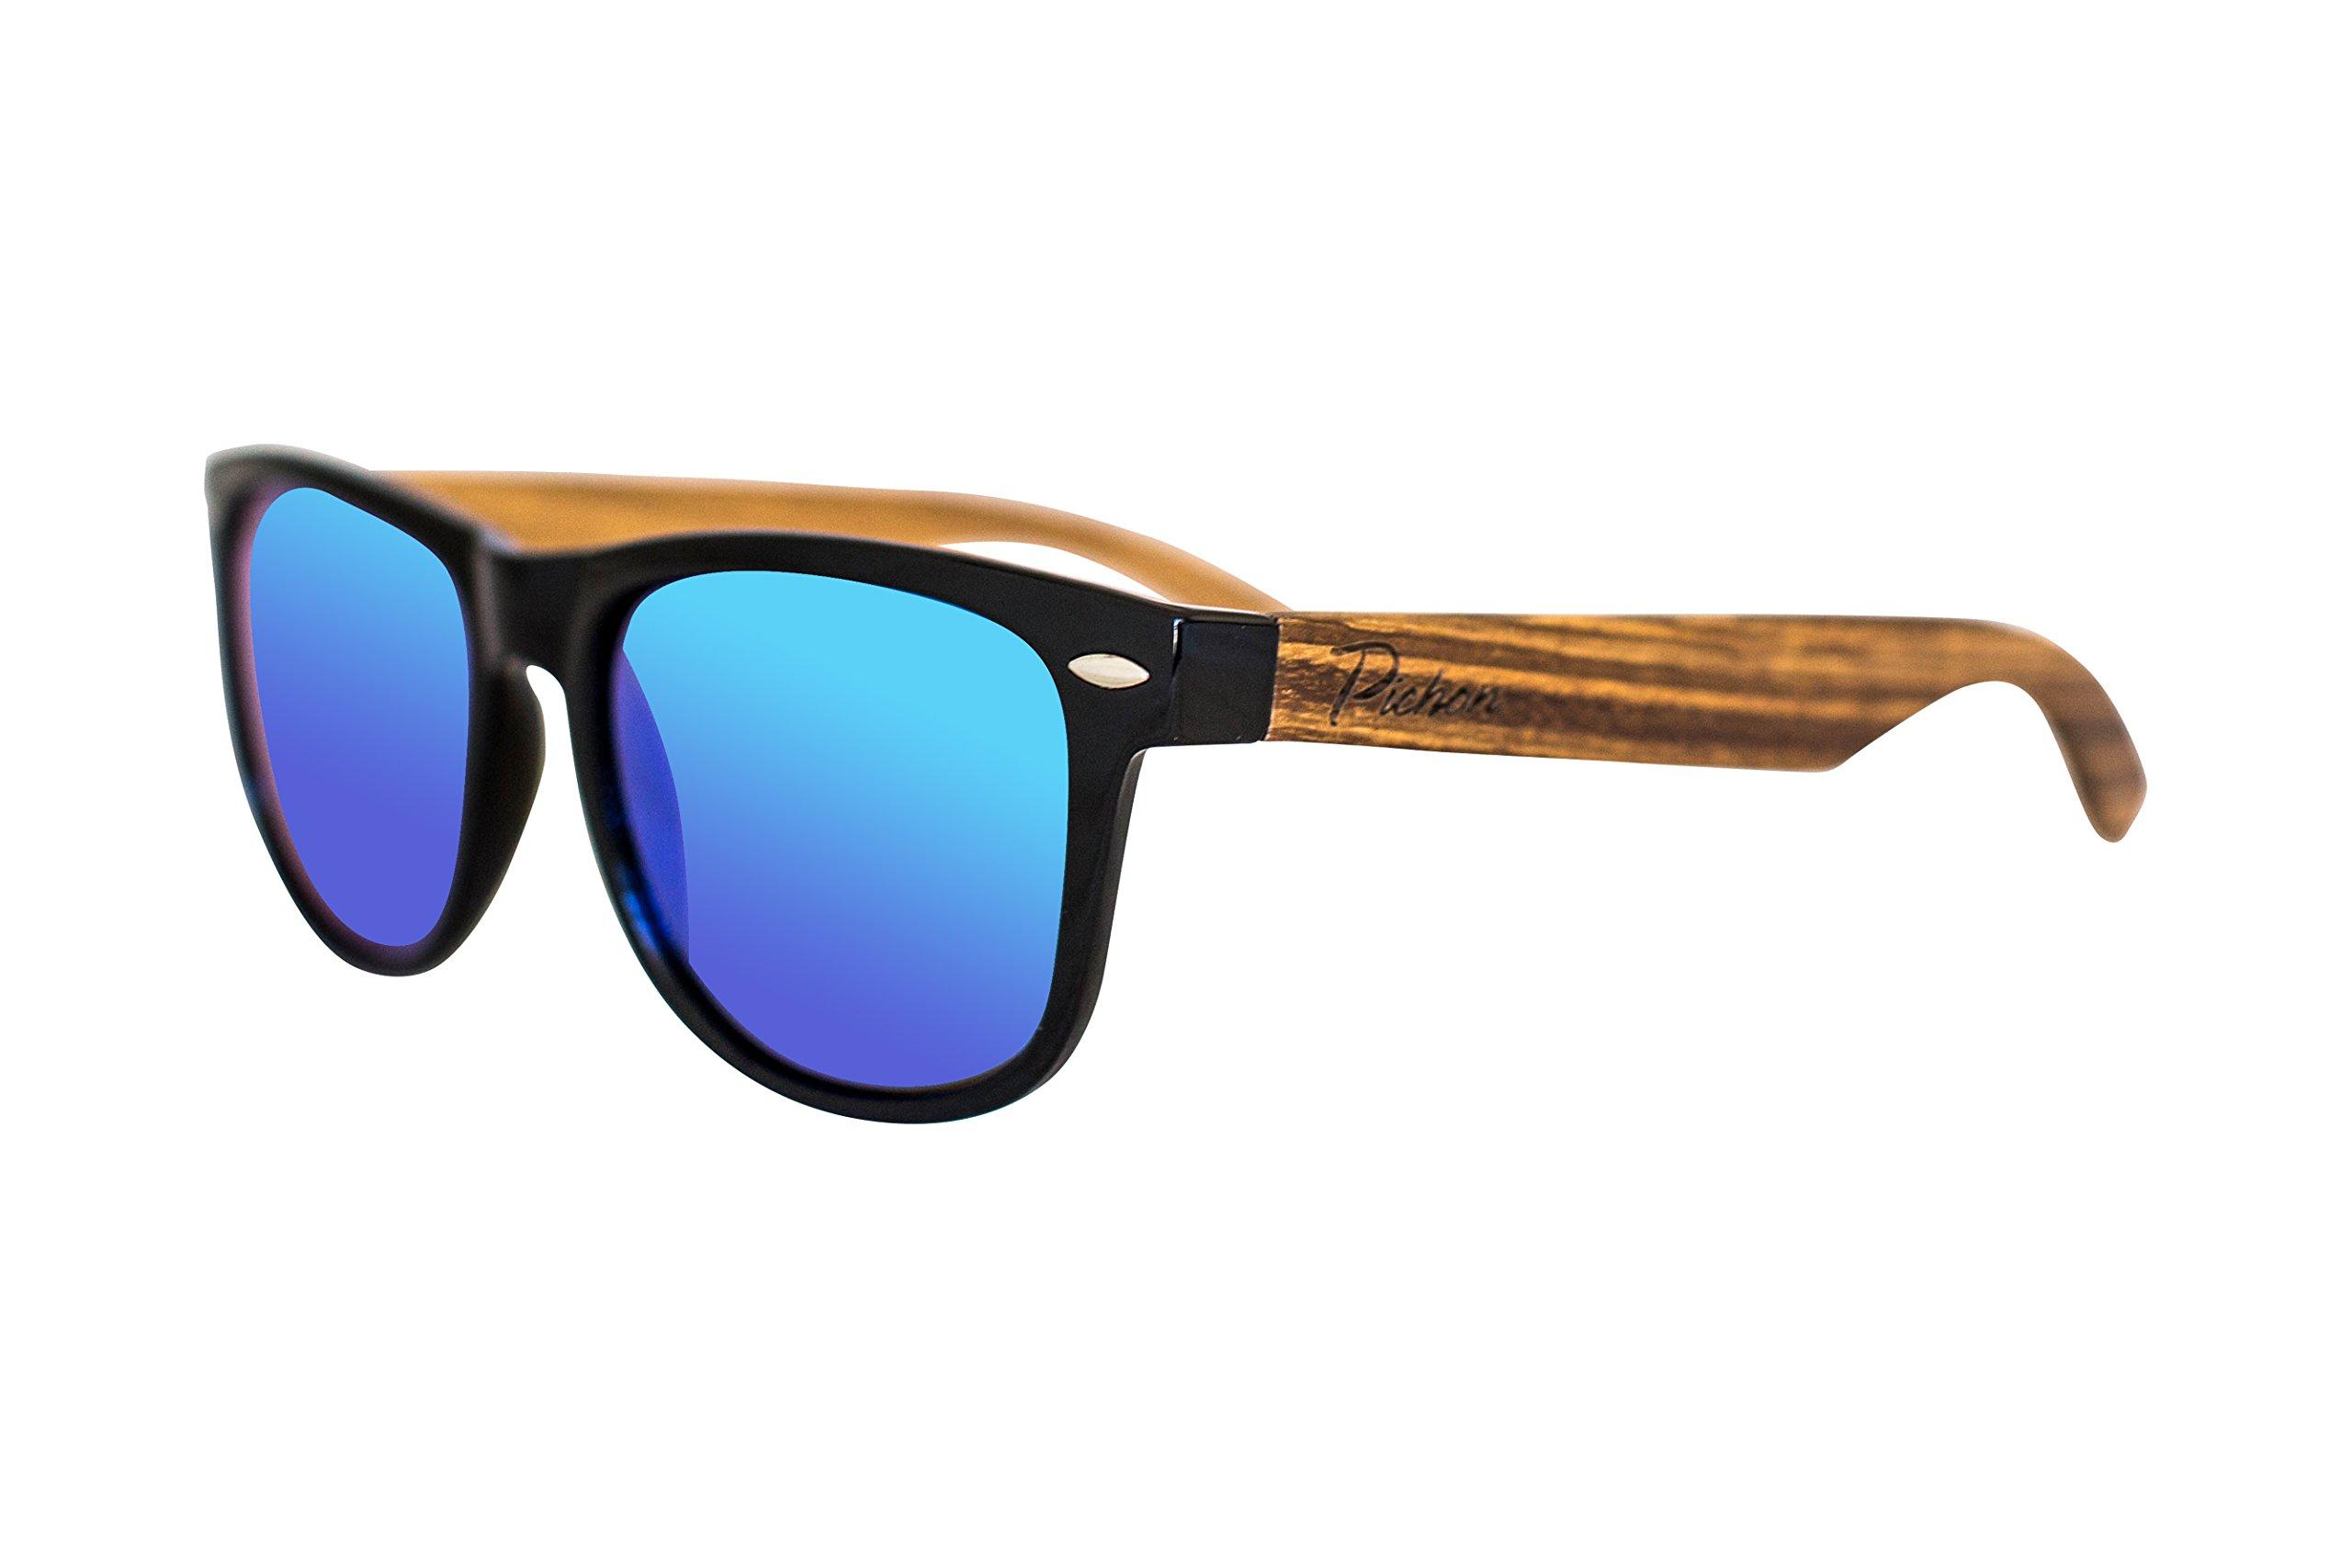 100% Bamboo Wood Wayfarer Sunglasses| Light, Strong & Eco-friendly| Green Mirrored POLARIZED Unisex